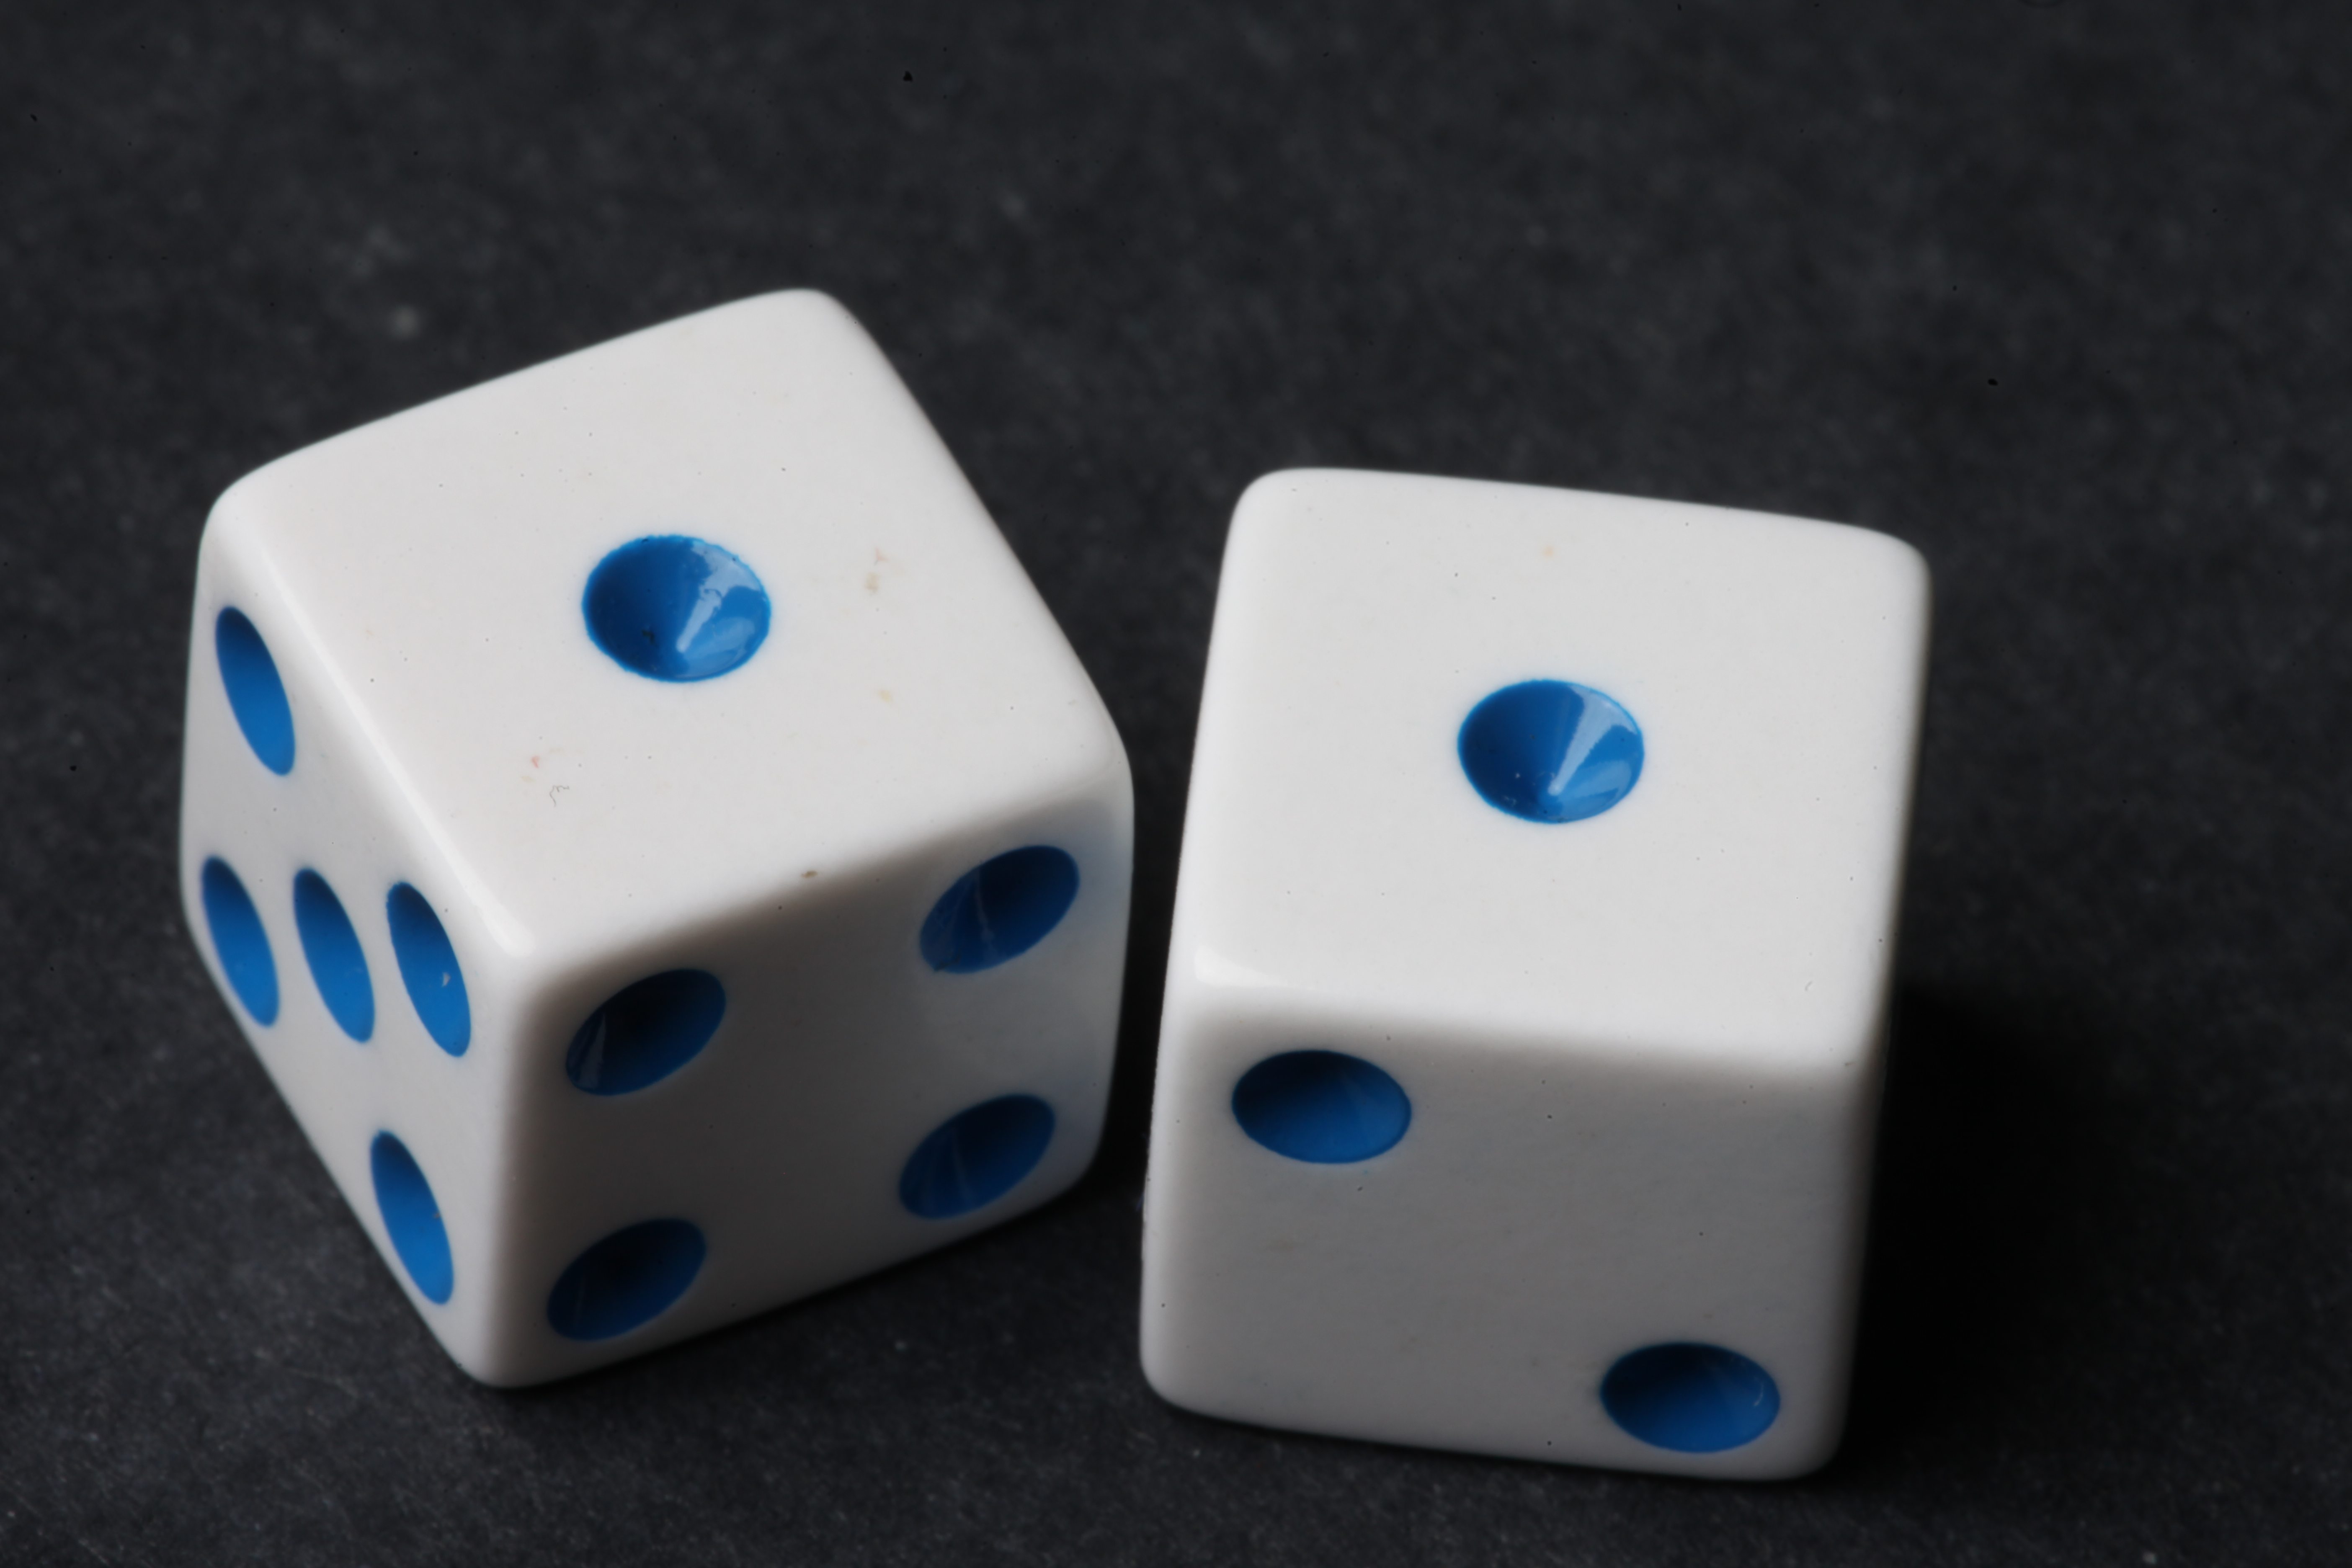 Dice, Bet, Gamble, Roll, Win, HQ Photo